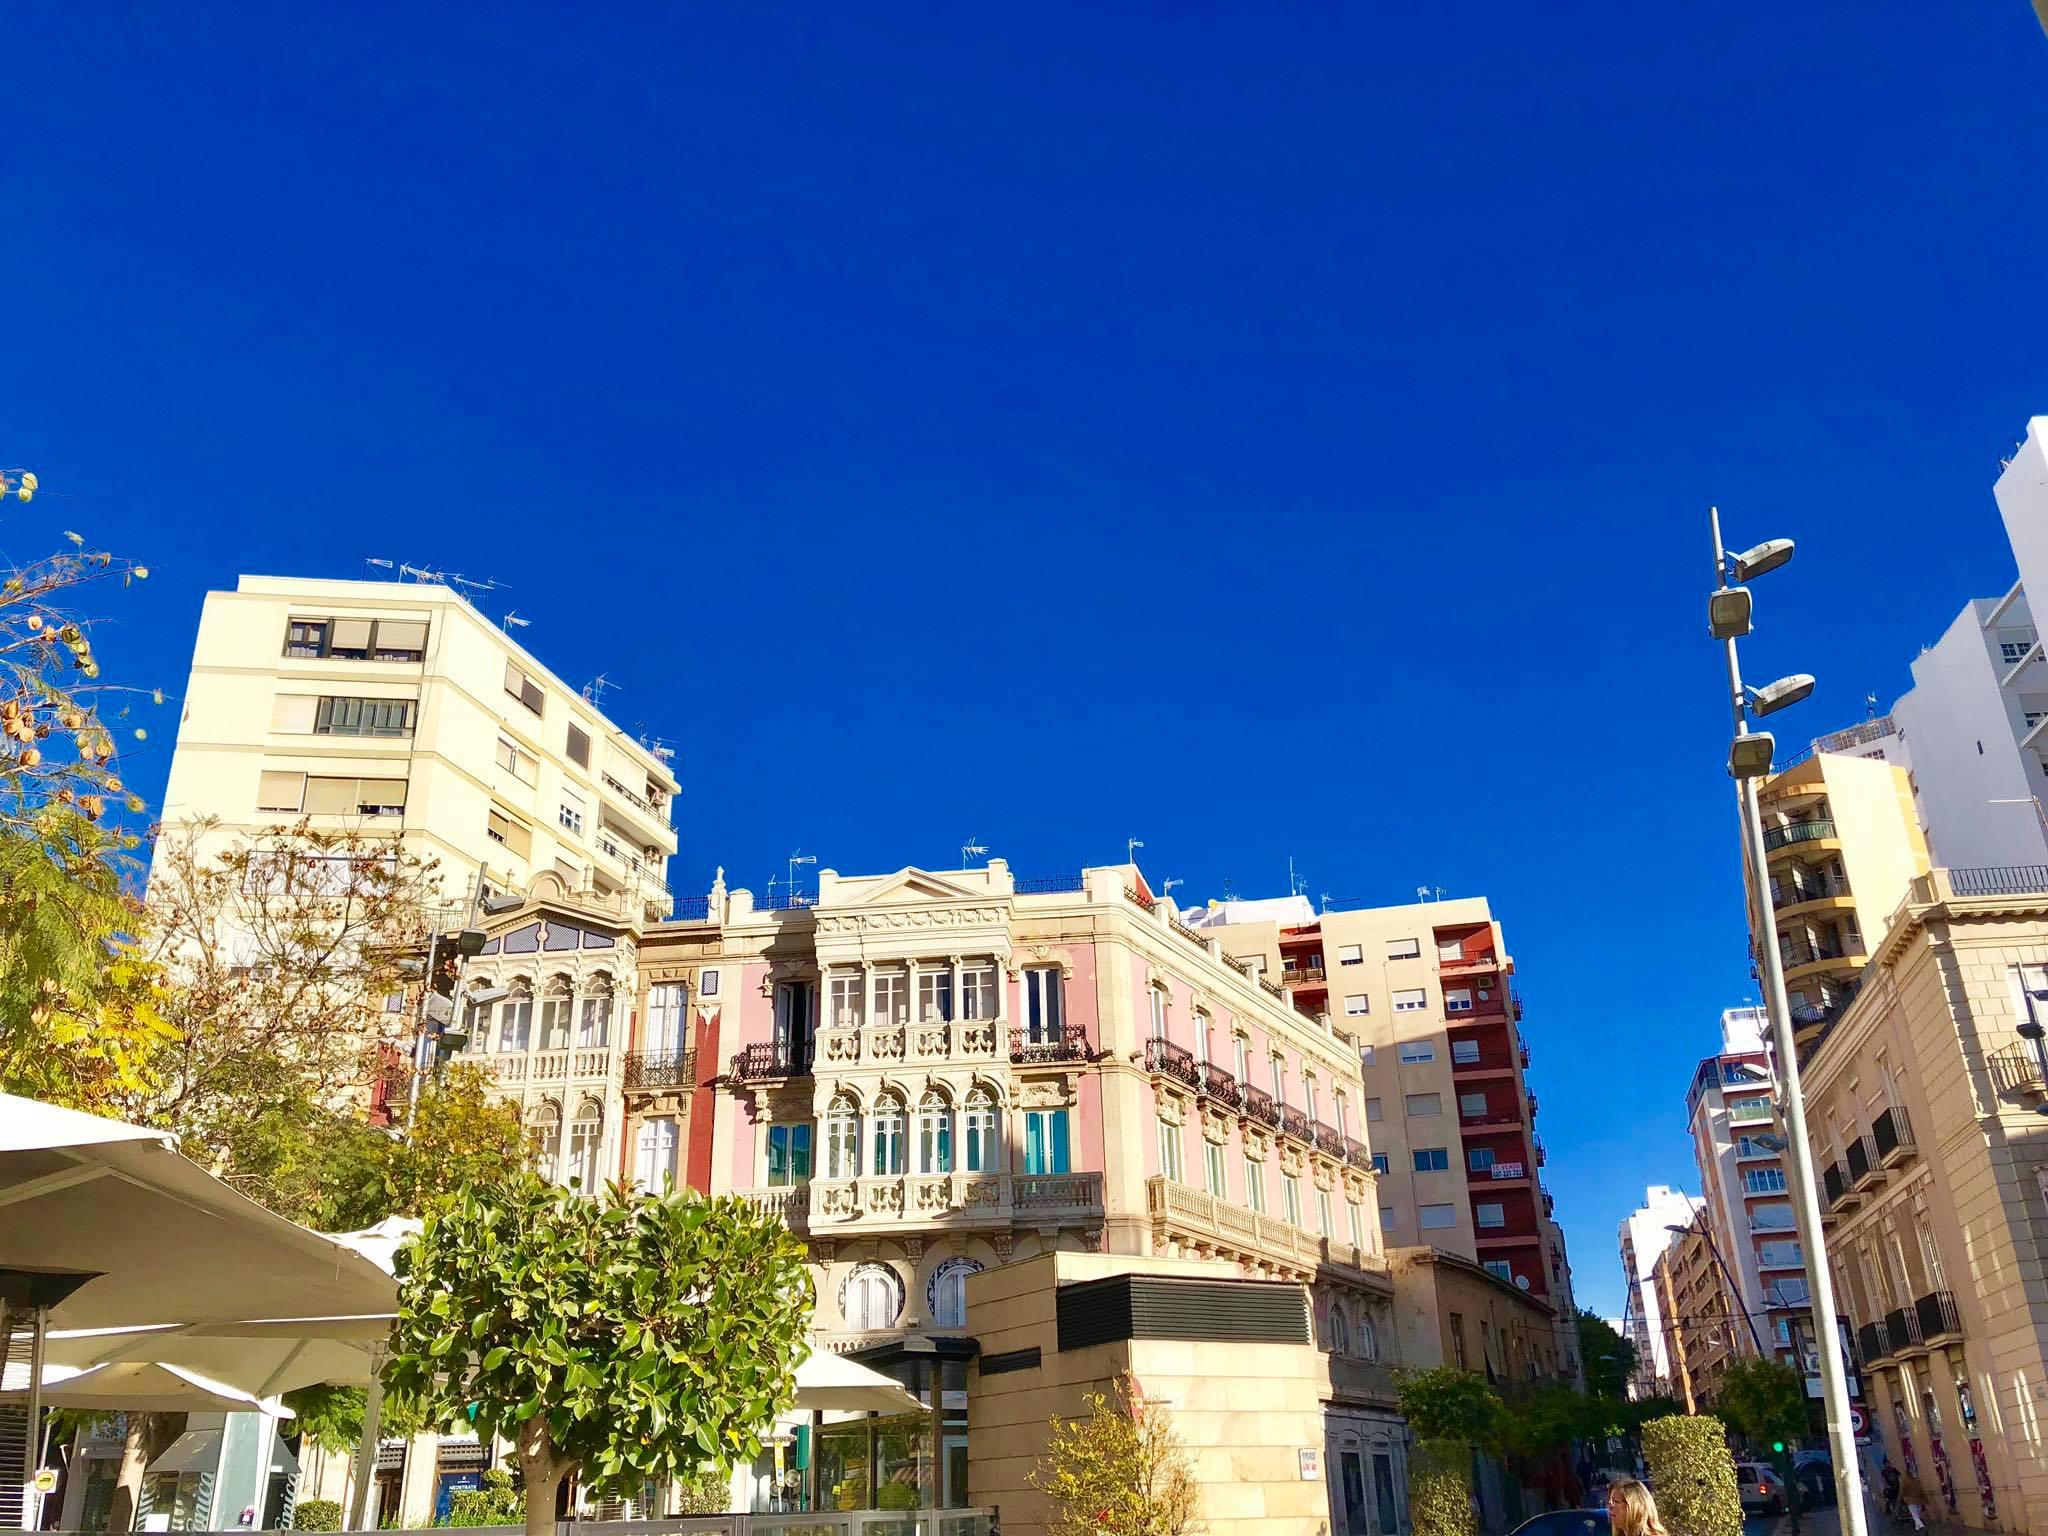 Kach Solo Travels in 2019 Thanks to Cámara de Comercio de Almería6.jpg